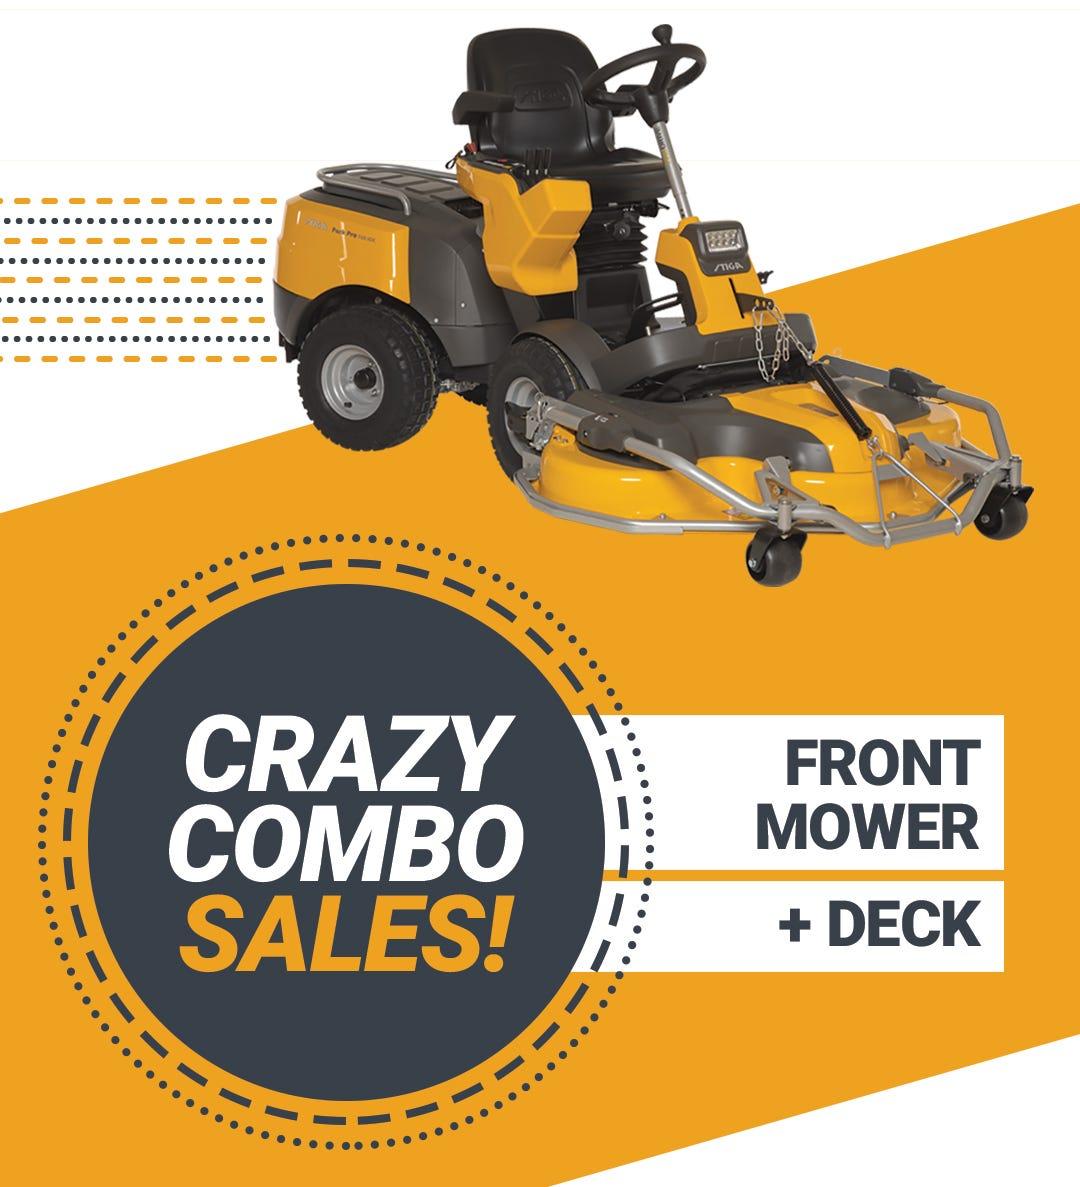 Crazy Combo Sales!